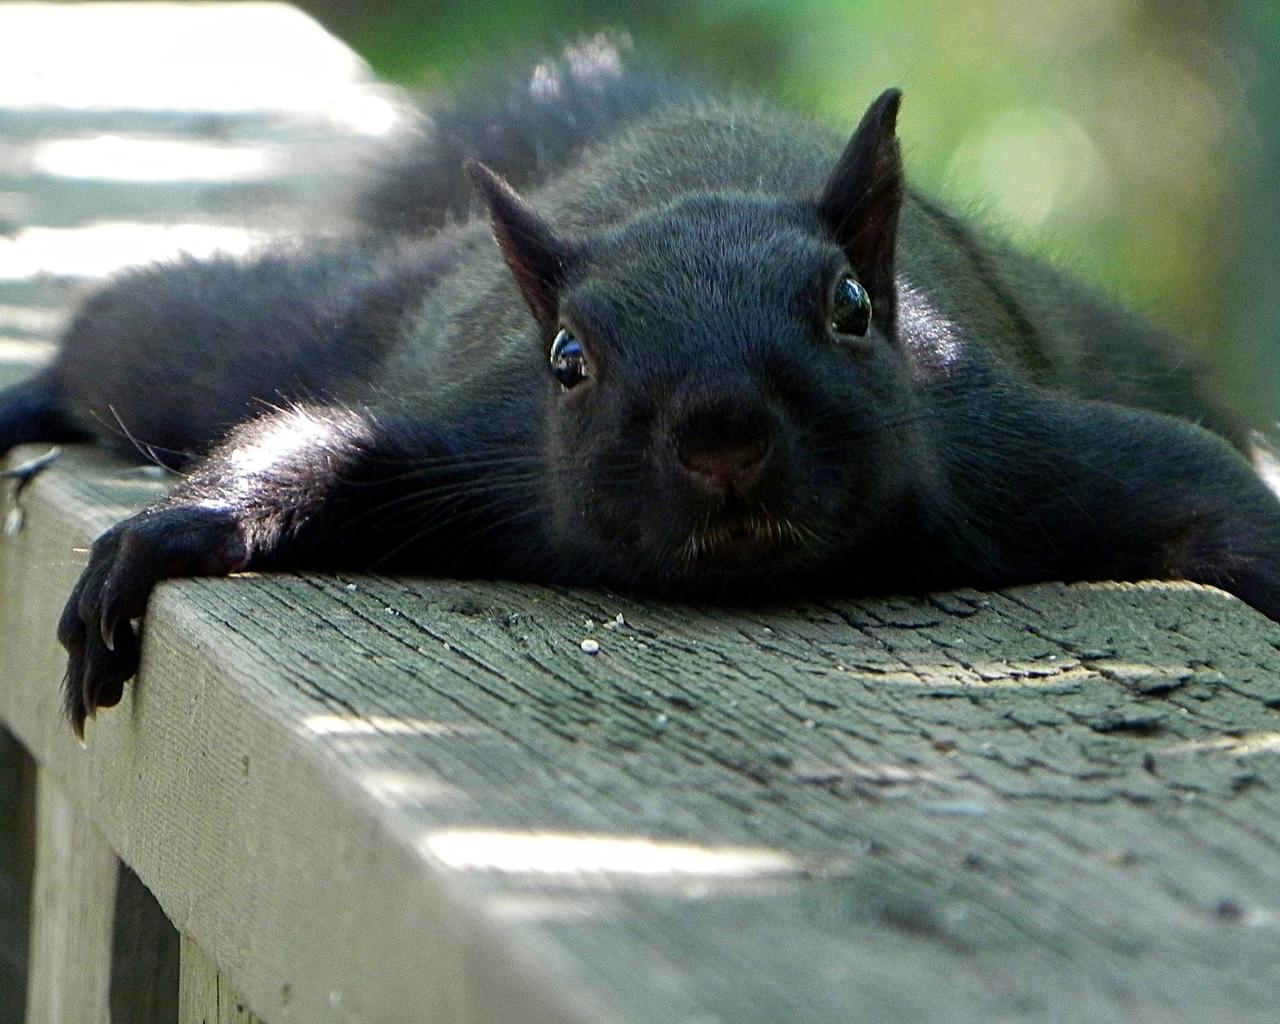 Animals funny squirrels (1280x1024)